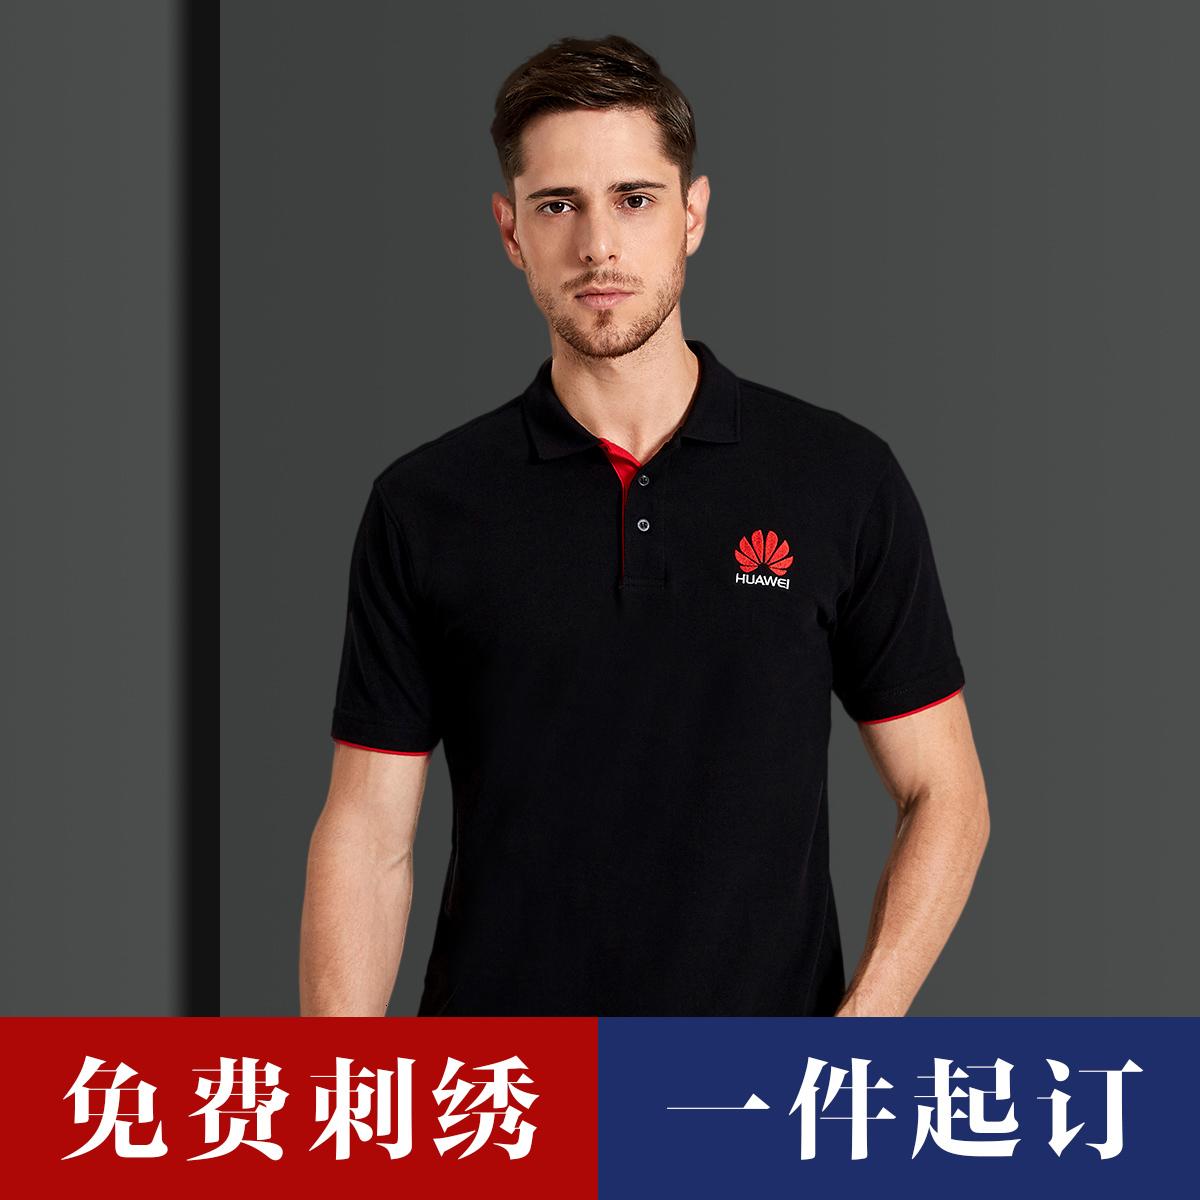 Business Polo Shirt Short Sleeve Work Clothes Custom Work Clothes Diyt